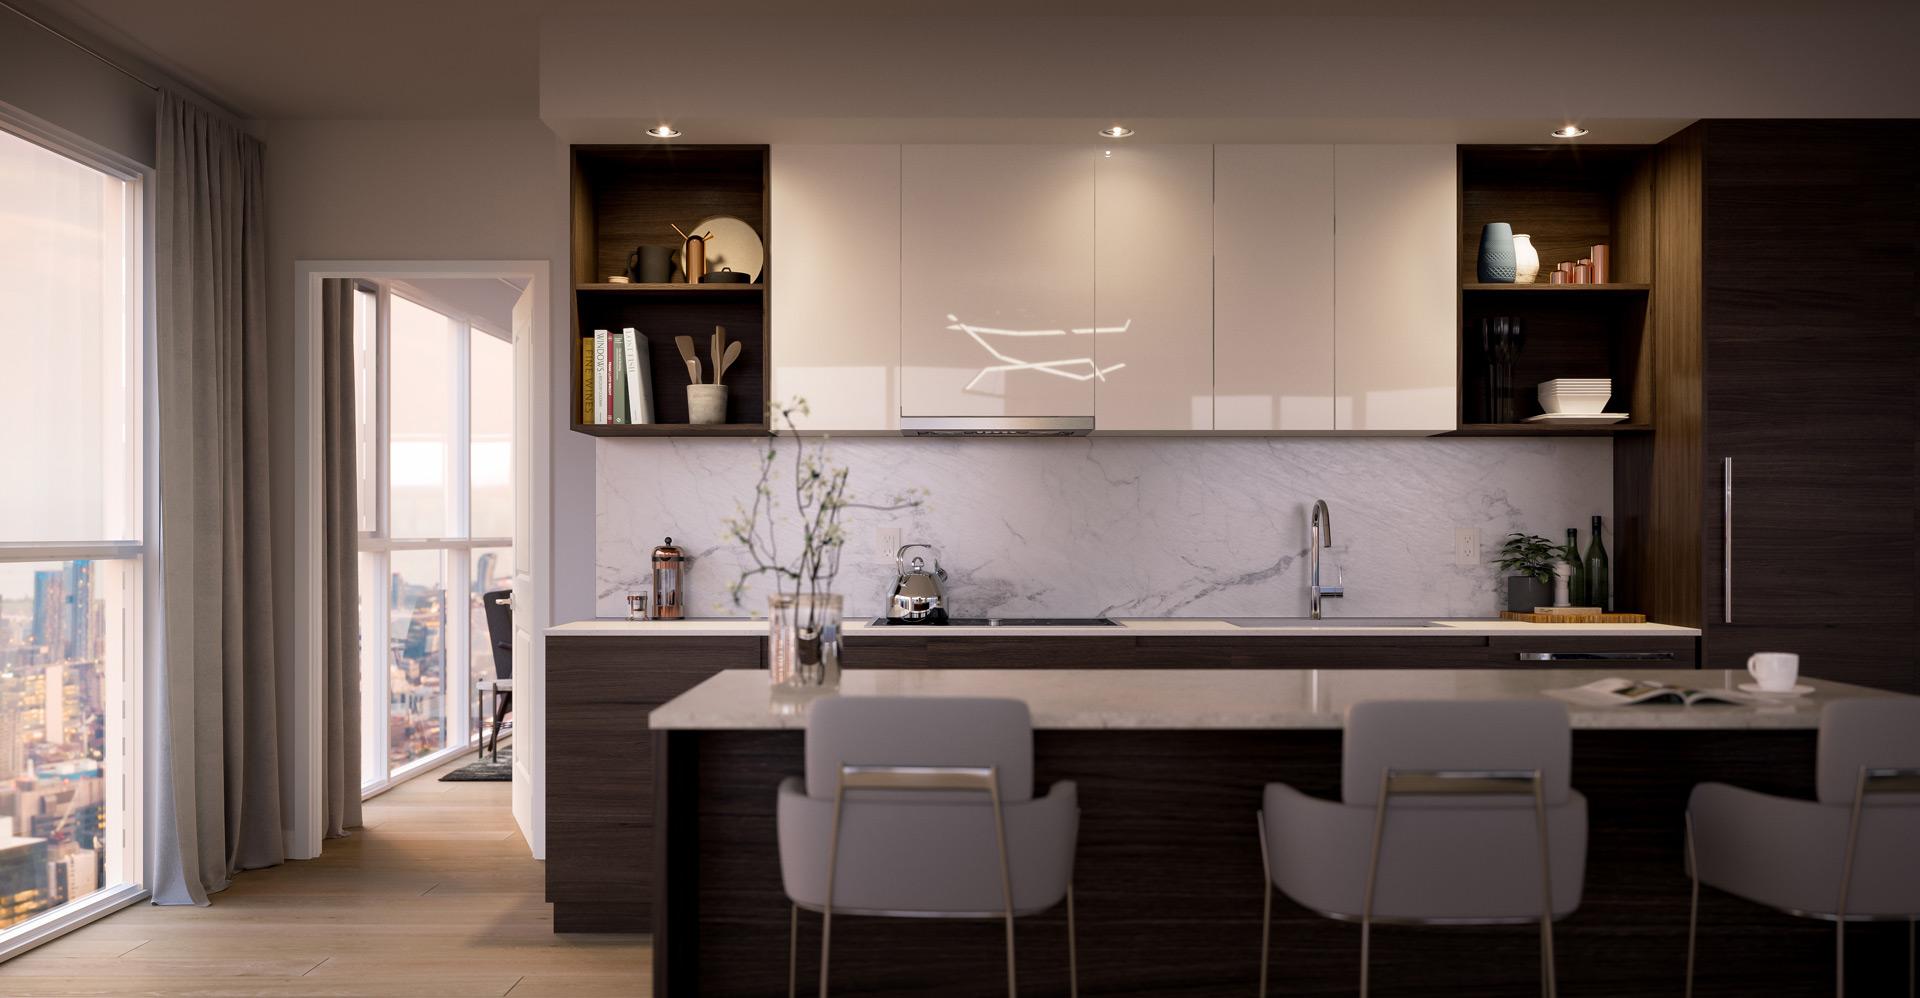 NORM-LI_180410_INT_Kitchen_01.jpg